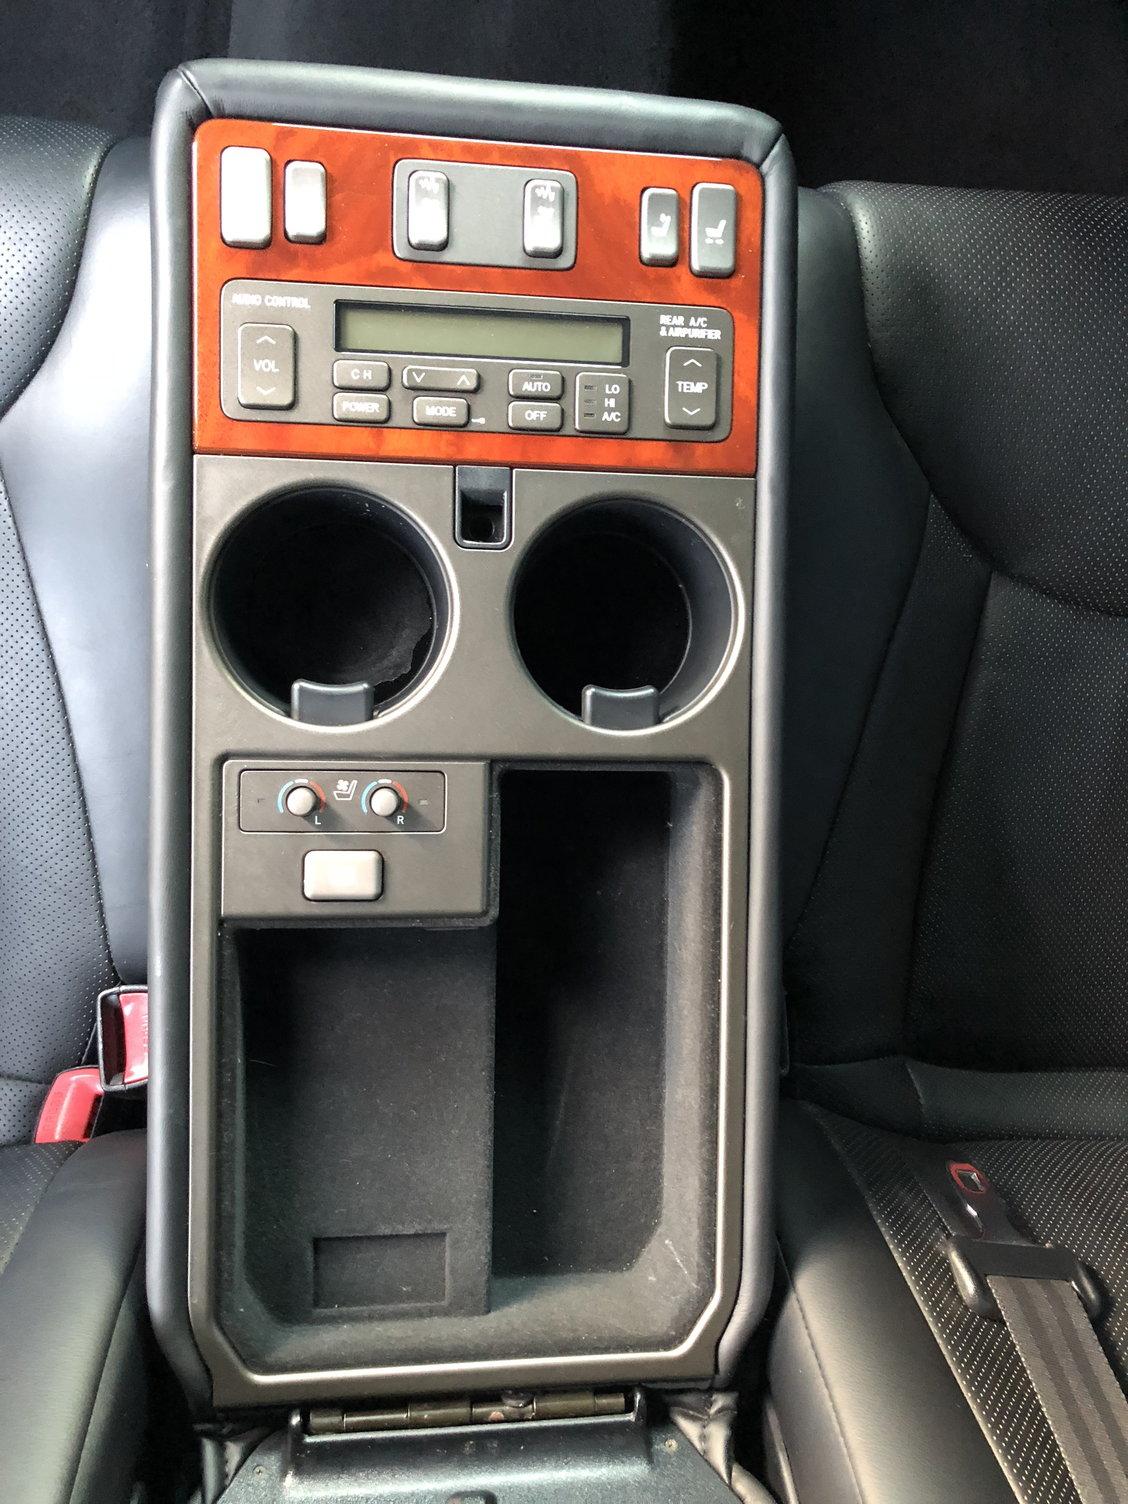 Ca 2006 Lexus Ls430 Ultra Luxury Clublexus Lexus Forum